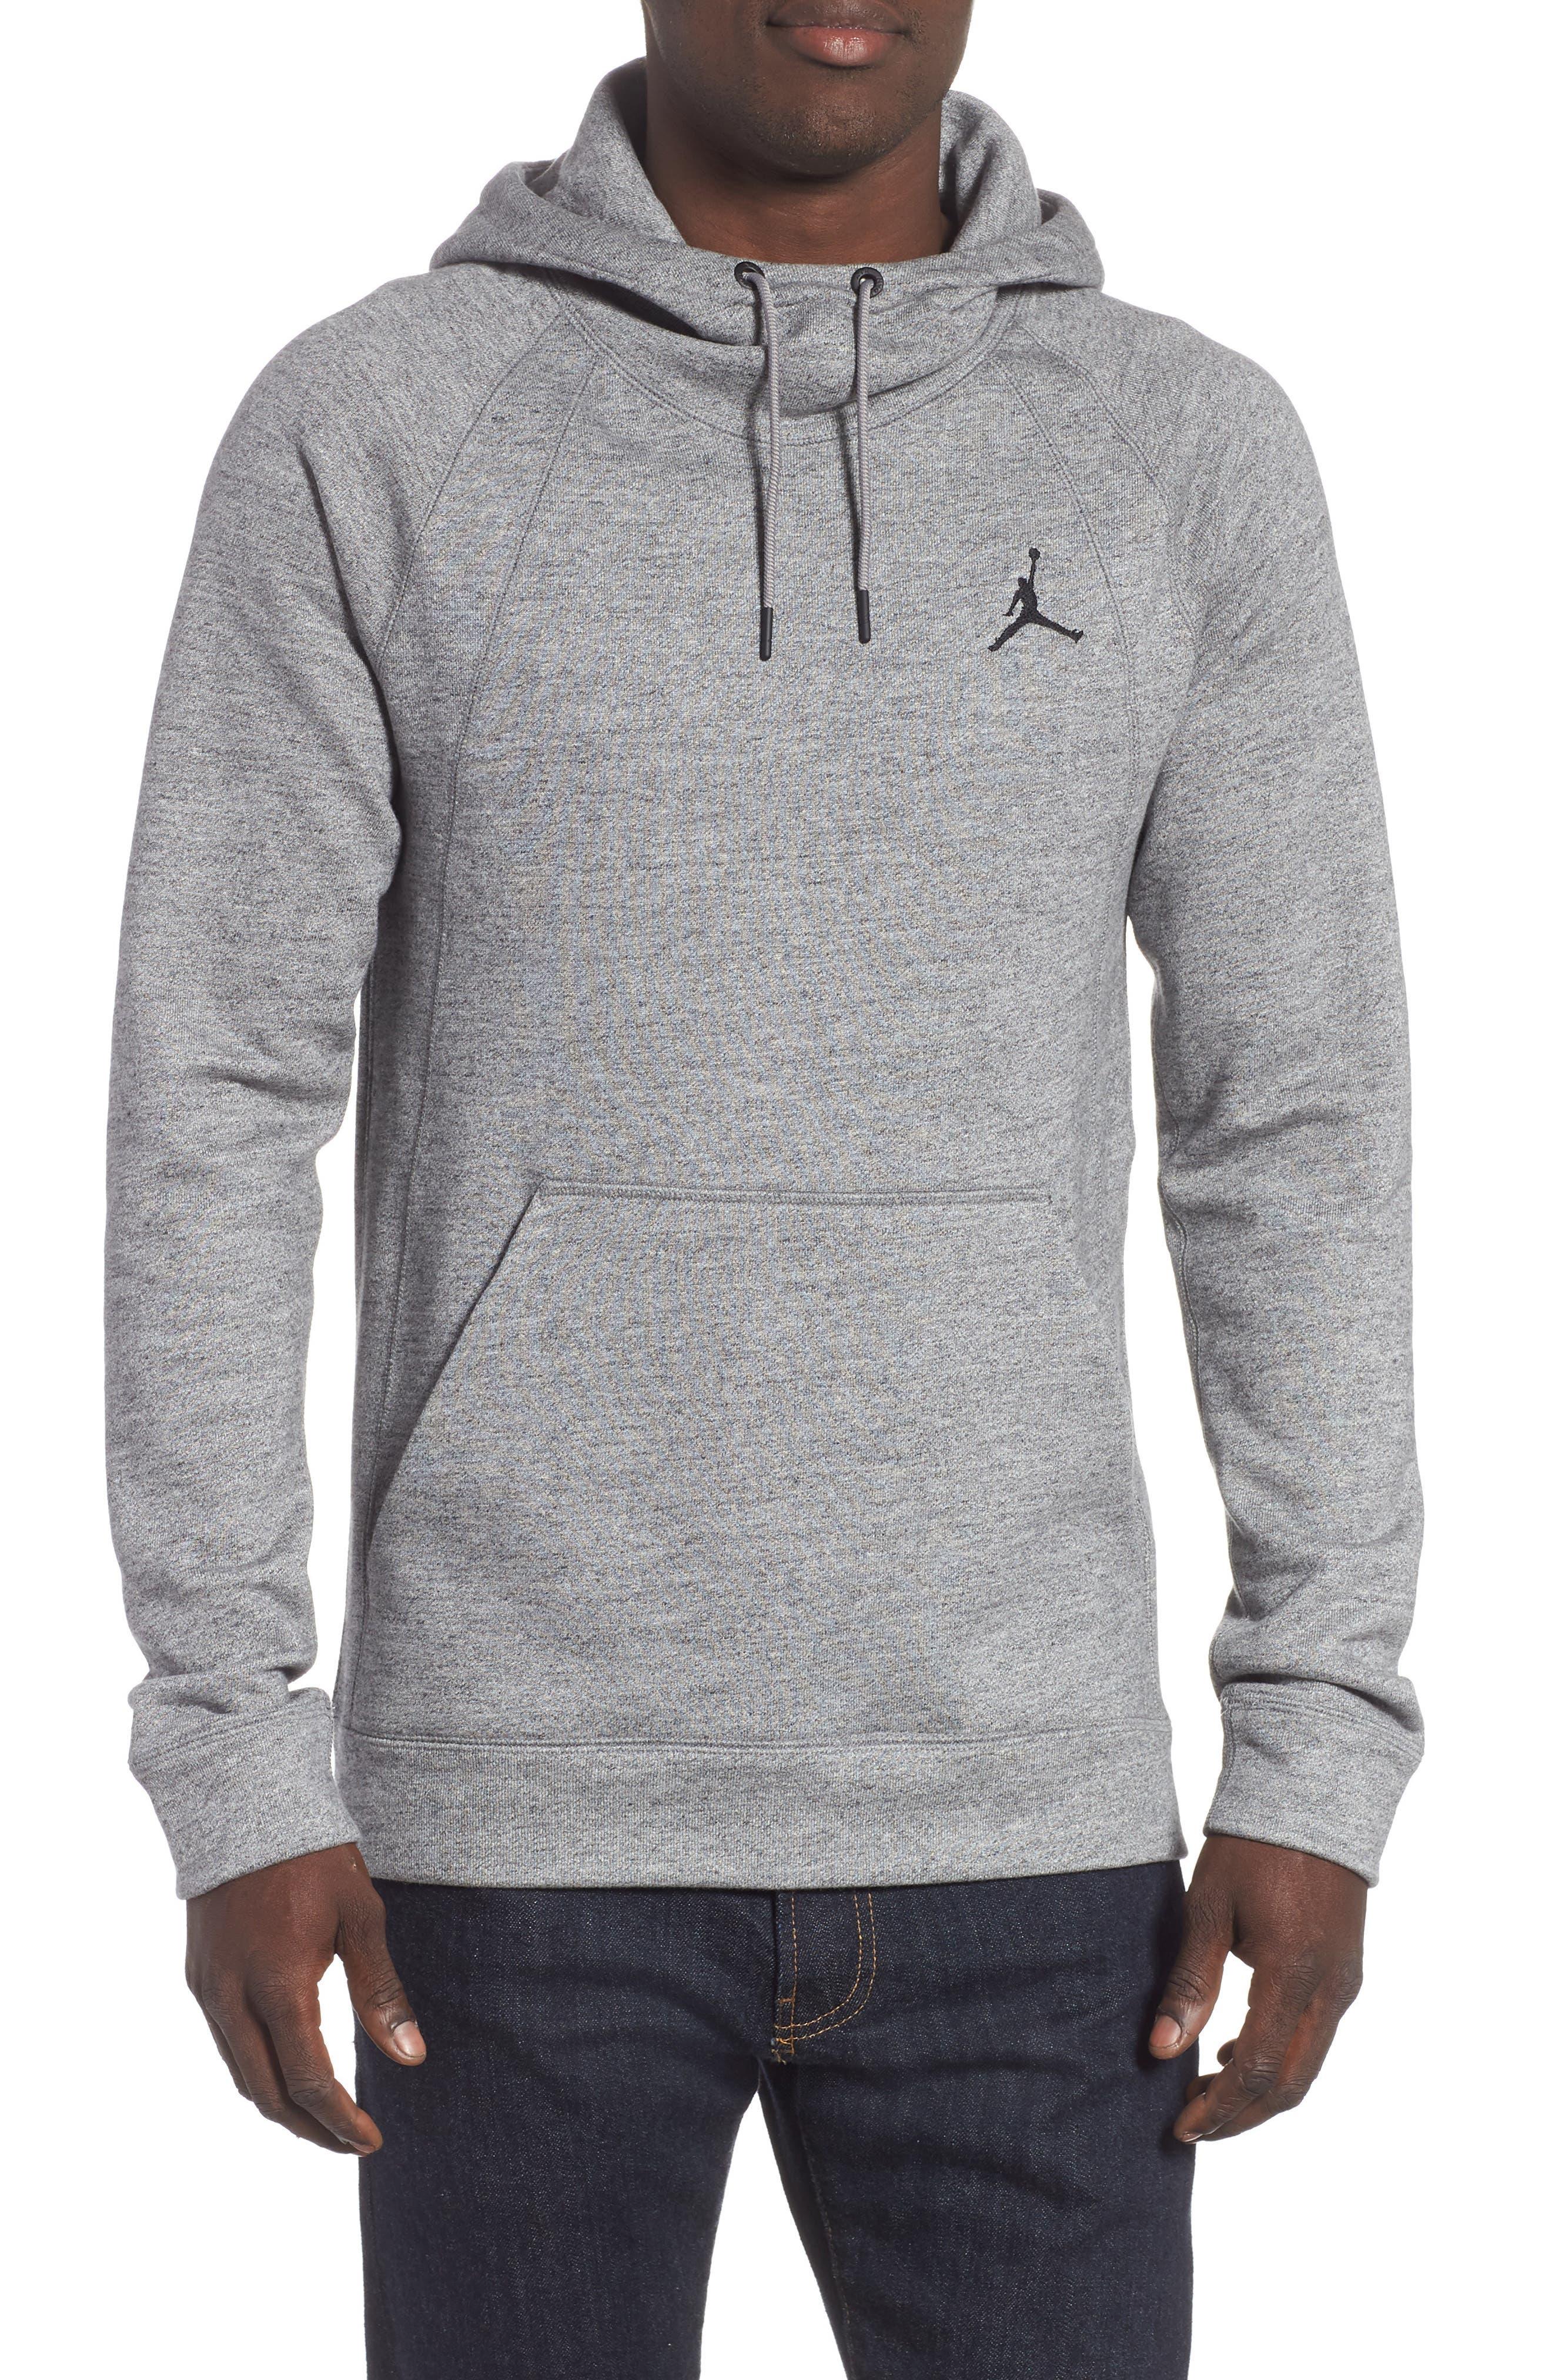 00c75e7bba5e Men s Jordan Hoodies   Sweatshirts